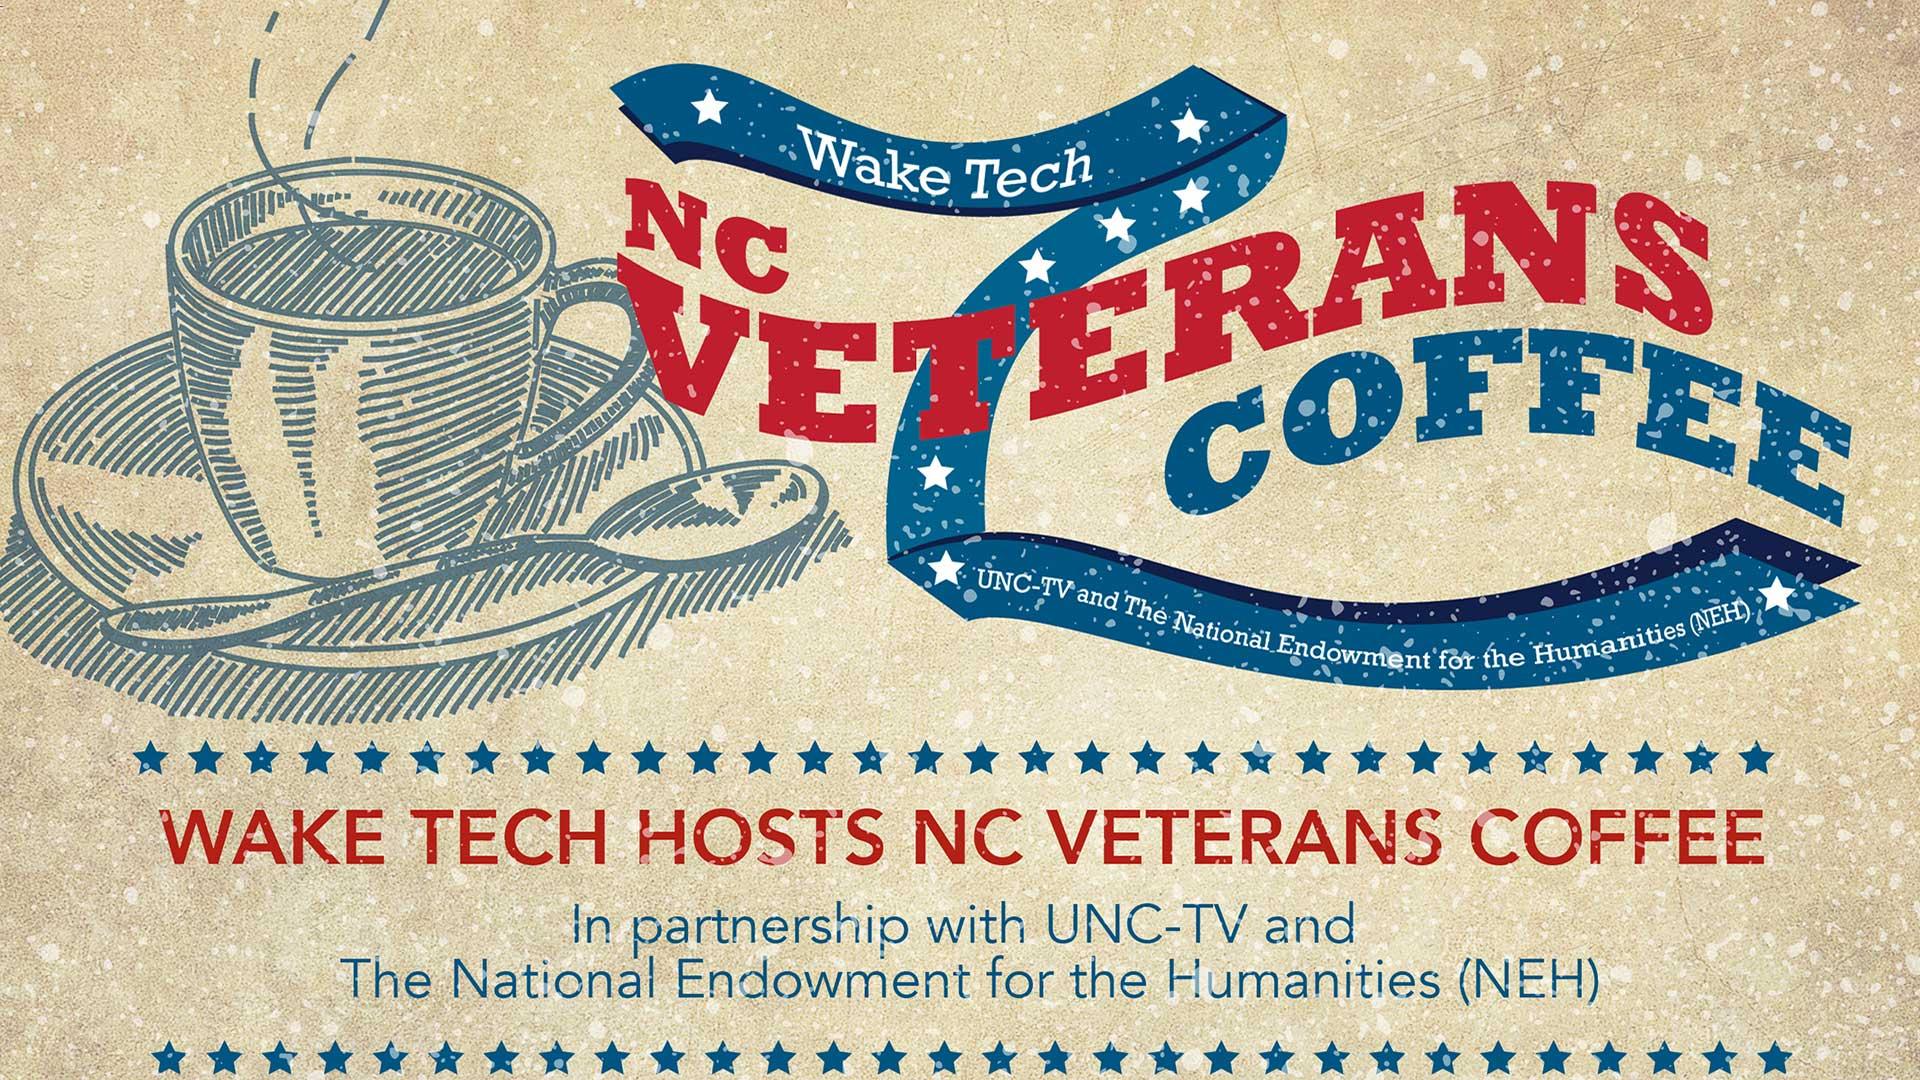 Veterans Coffee: Wake Tech